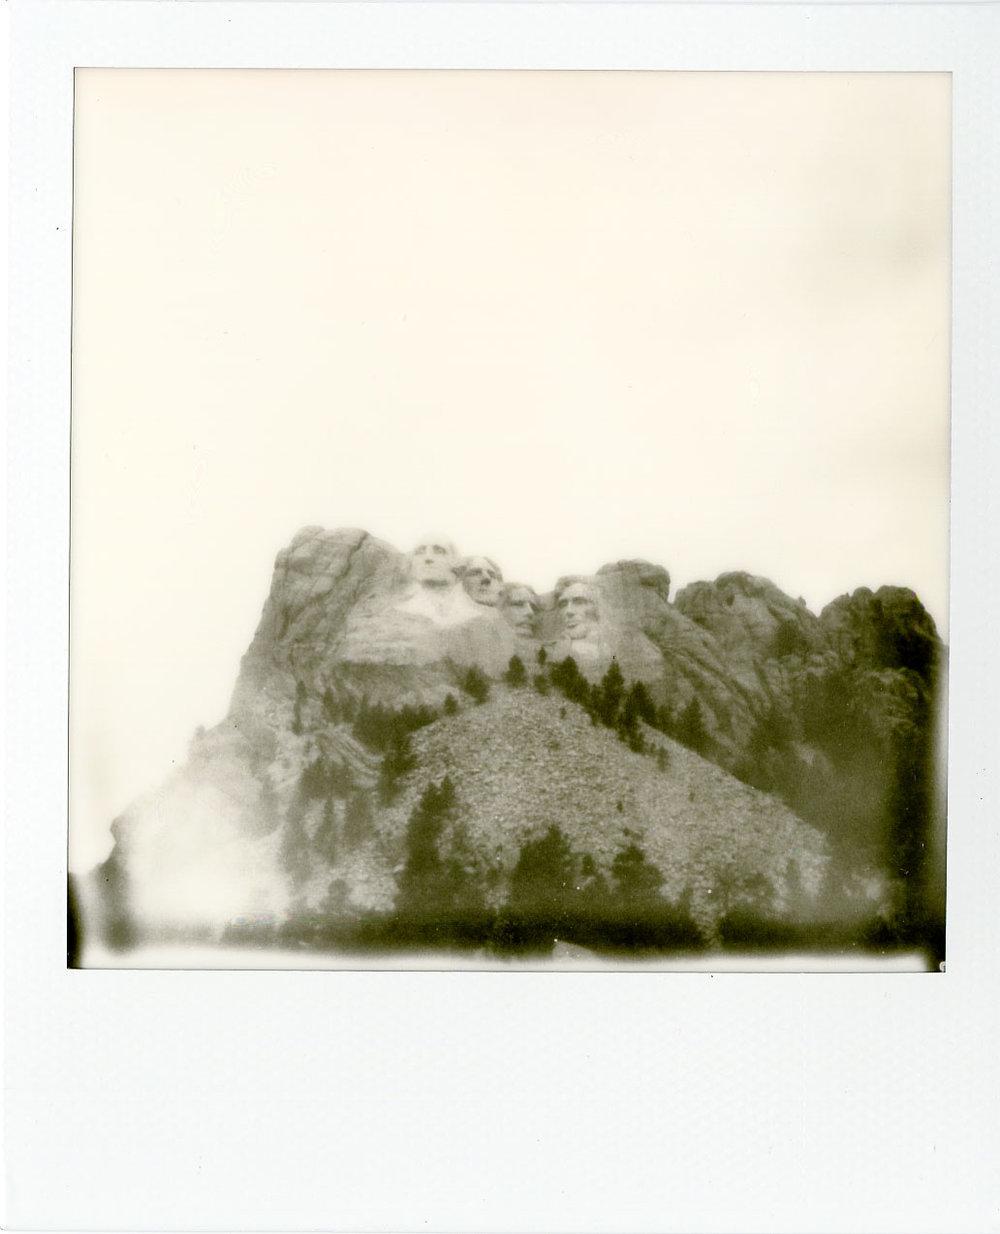 Mount_Rushmore_web.jpg